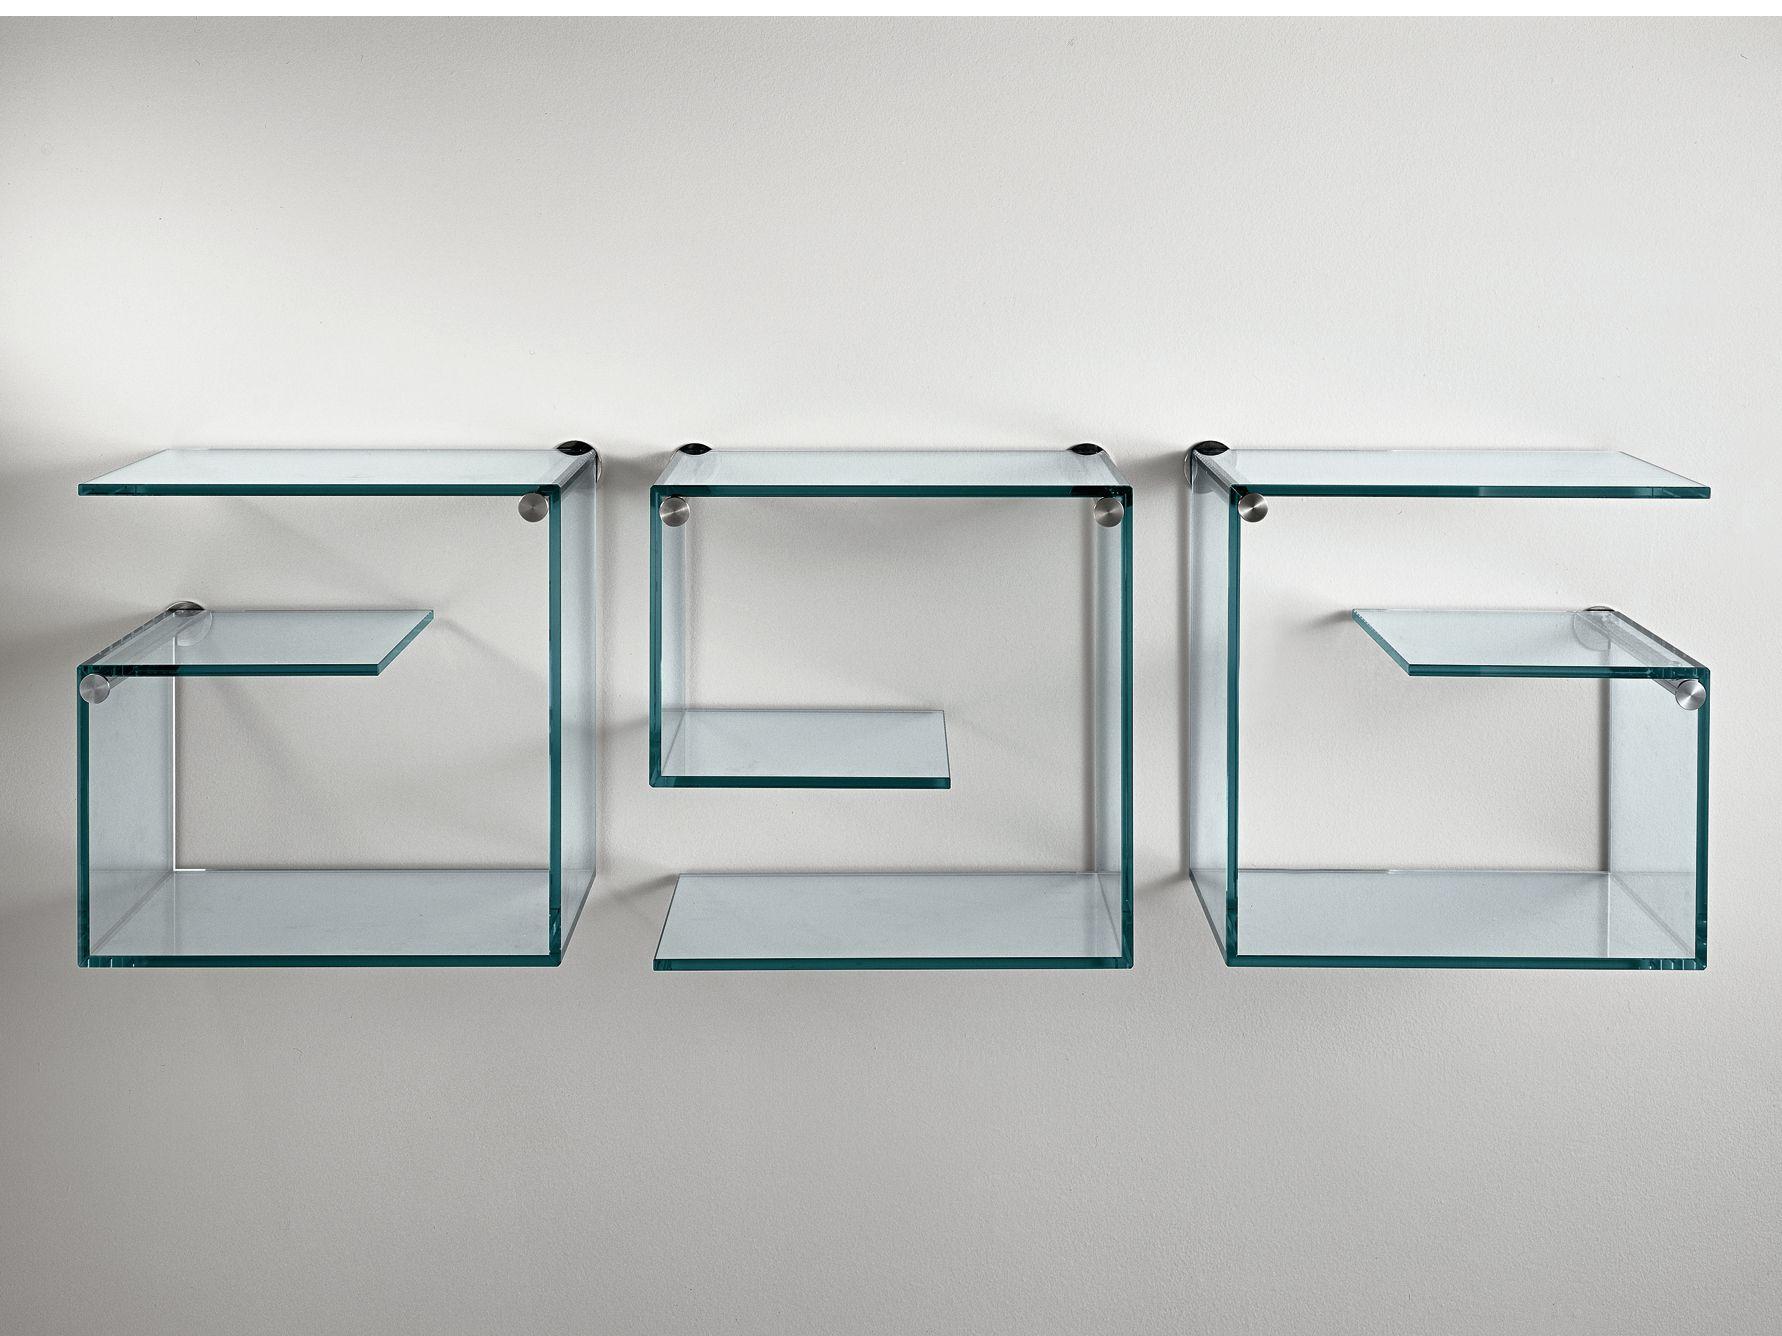 wand b cherregal aus glas alfabeta by t d tonelli design design emilio nanni fabio bortolani. Black Bedroom Furniture Sets. Home Design Ideas